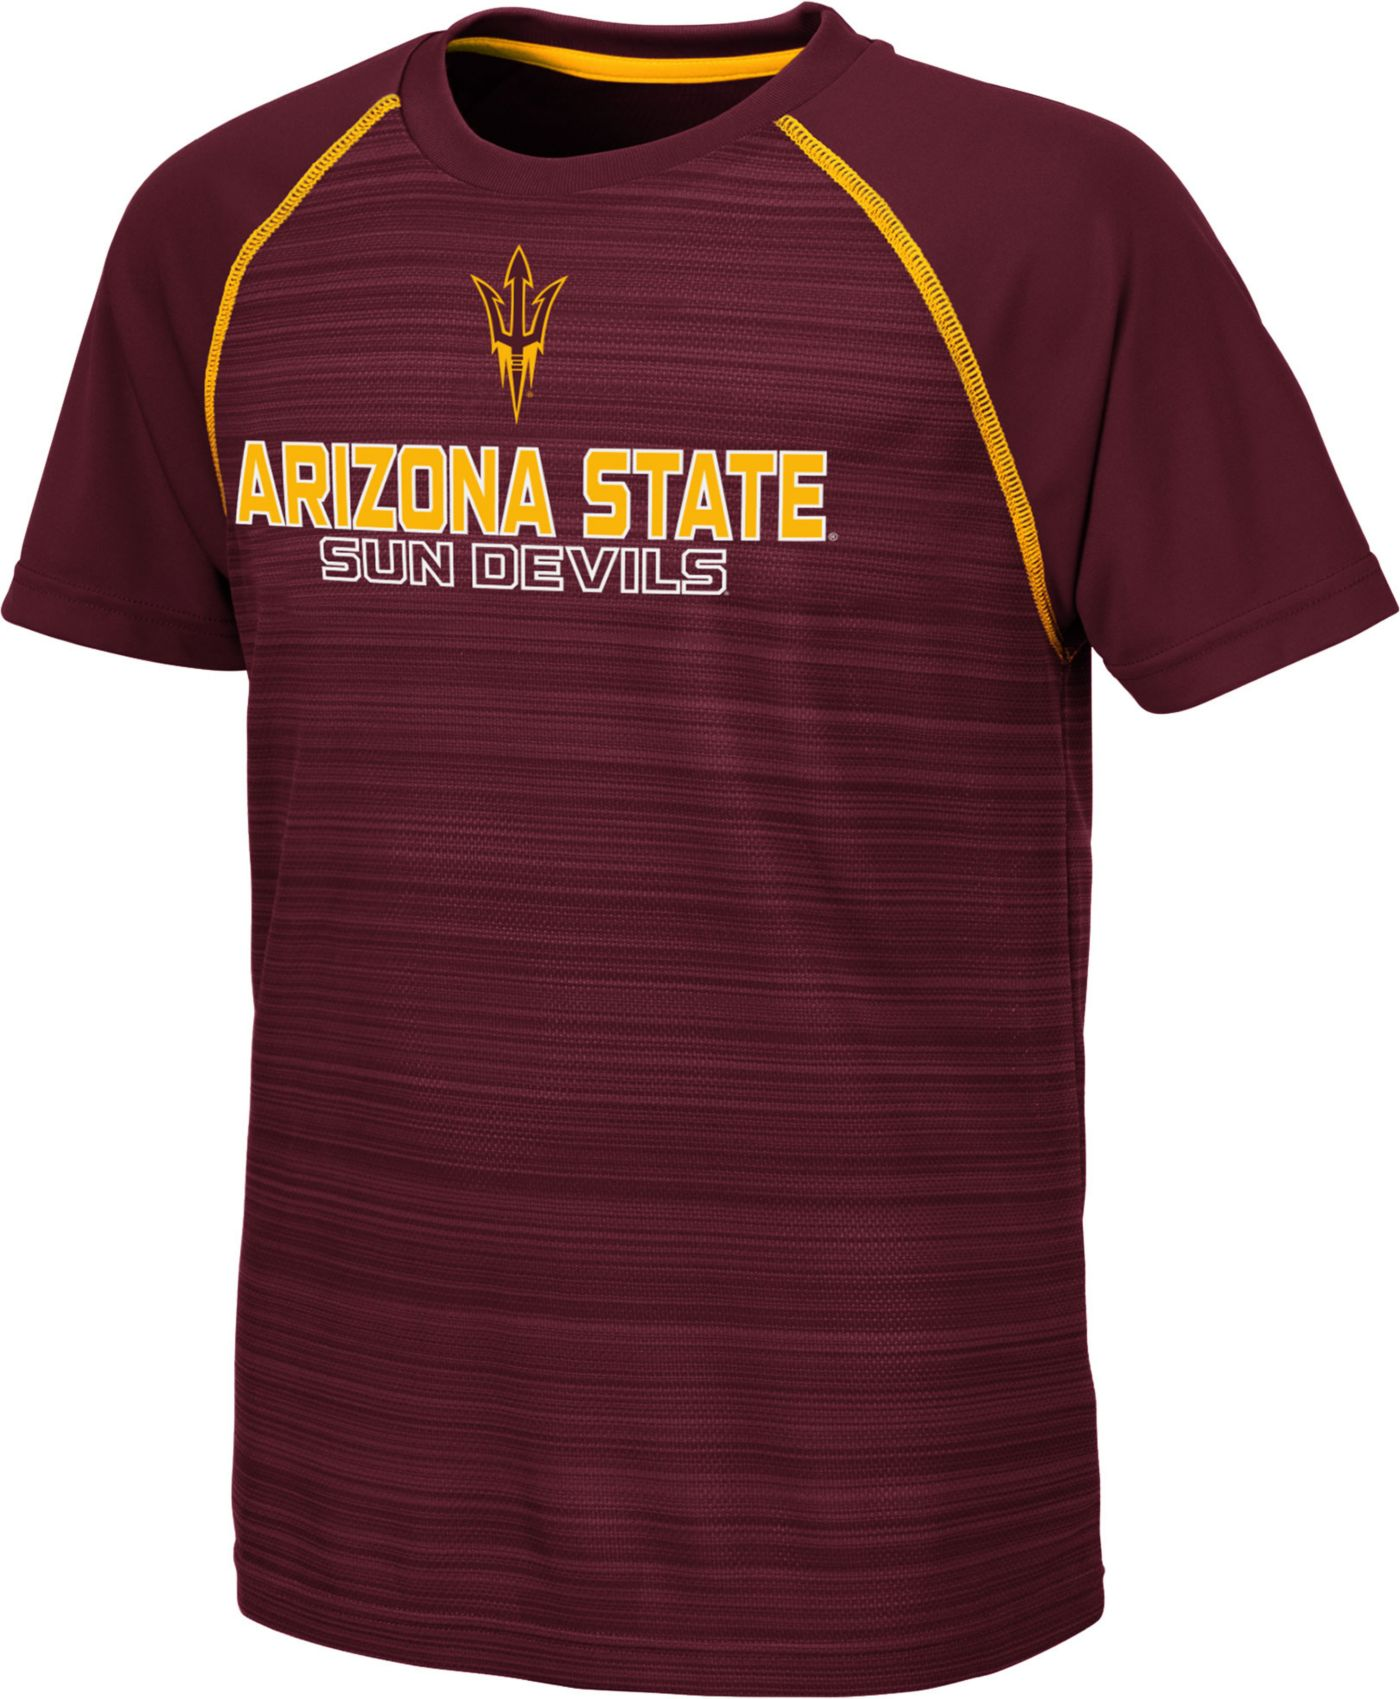 Colosseum Youth Arizona State Sun Devils Maroon Raglan T-Shirt